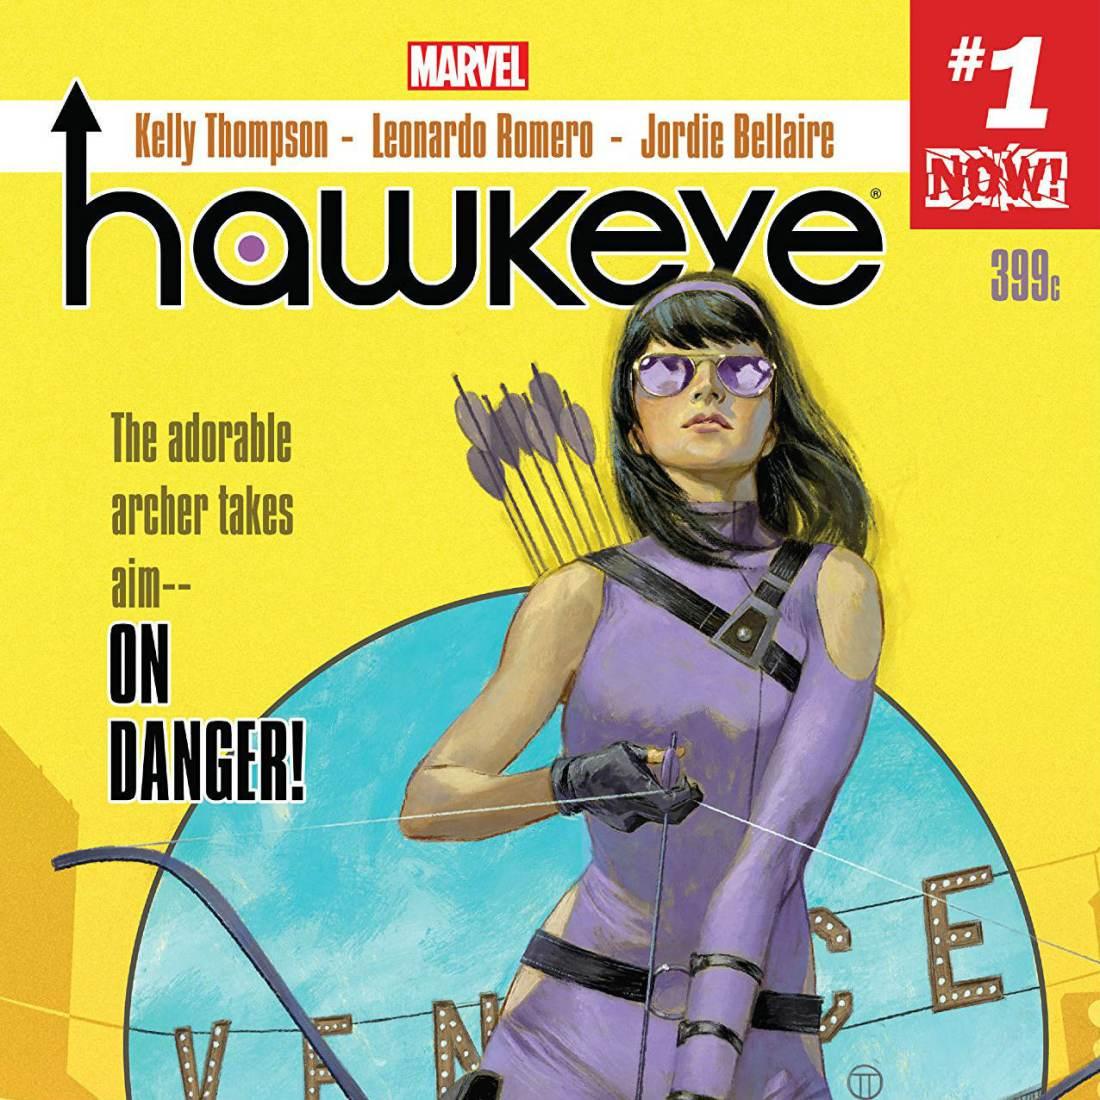 Hawkeye Kate Bishop Millennial Superhero - Matt Reads Comics